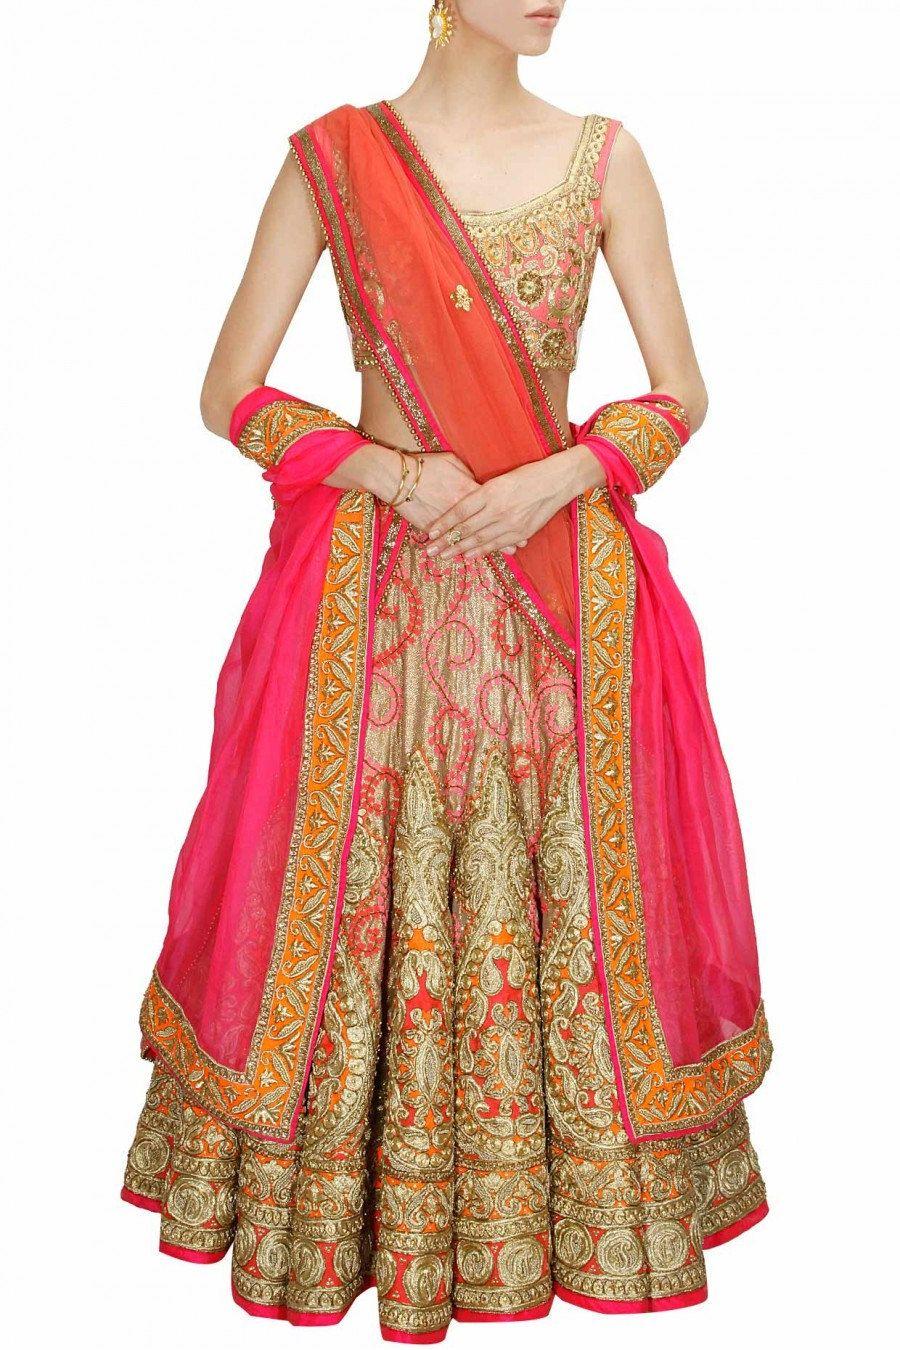 Pink dress to wear to a wedding  Golden and Pink Bridal Wedding Lehenga by PanacheHauteCouture